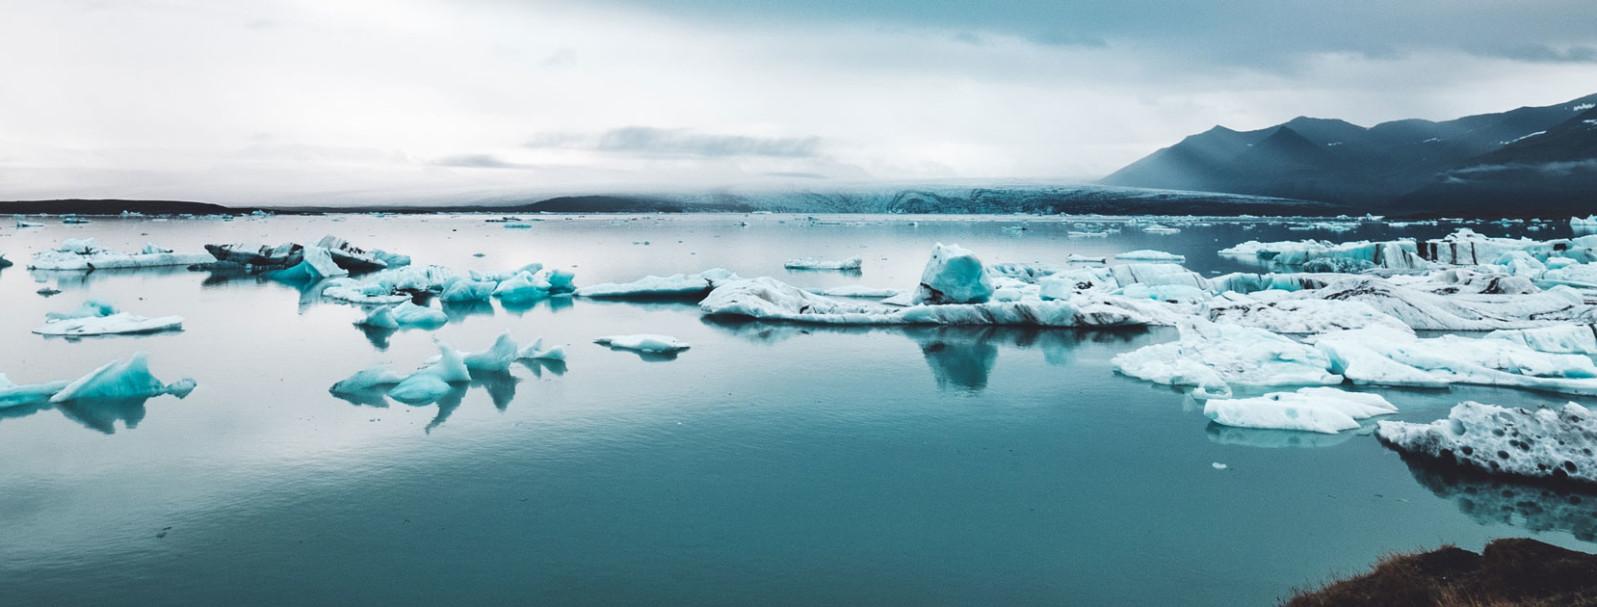 Panel Discussion: Service design wrangles climate change